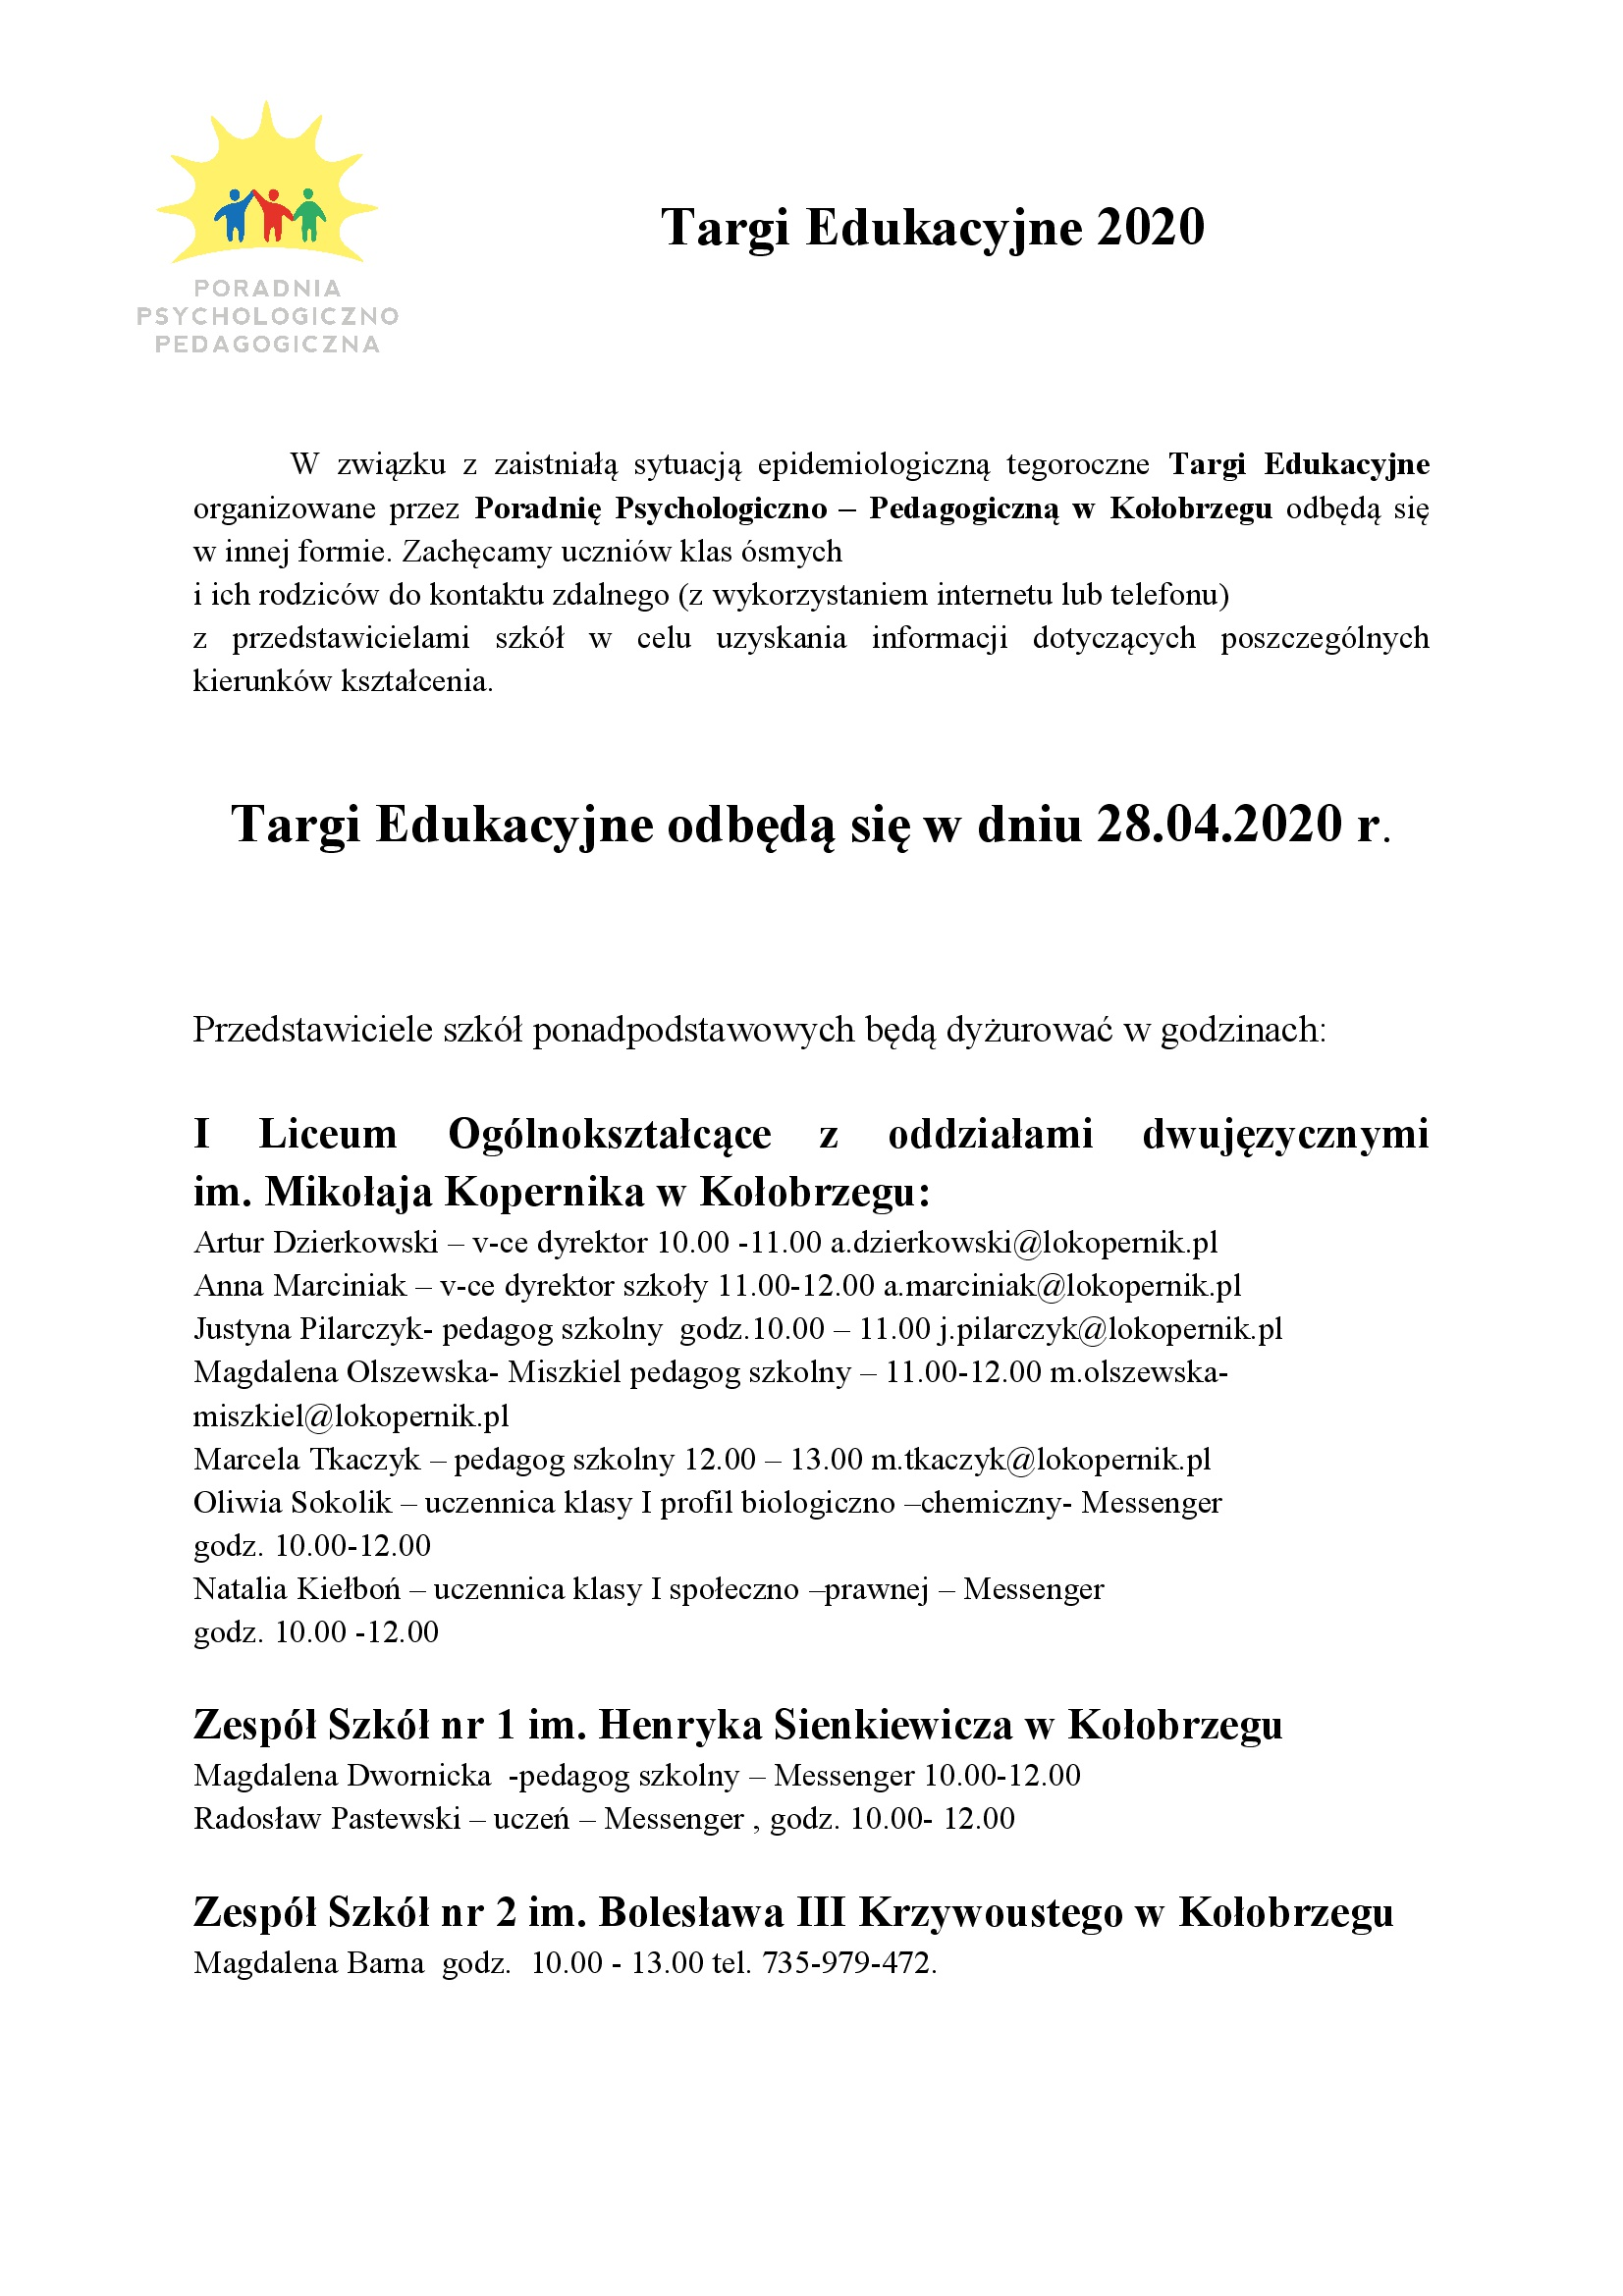 Targi Edukacyjne 2020(2)-001